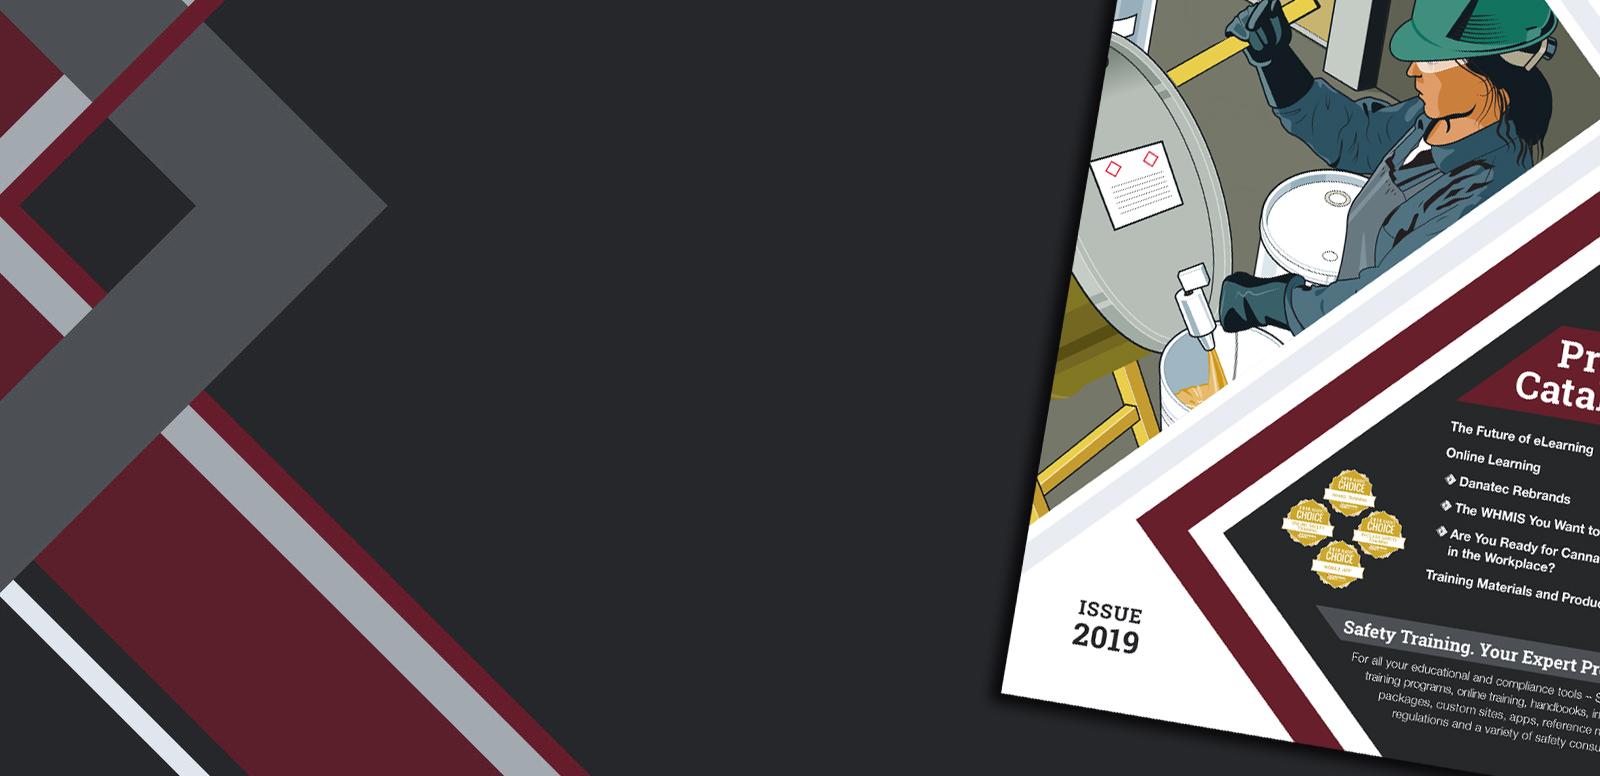 Danatec-catalog-header